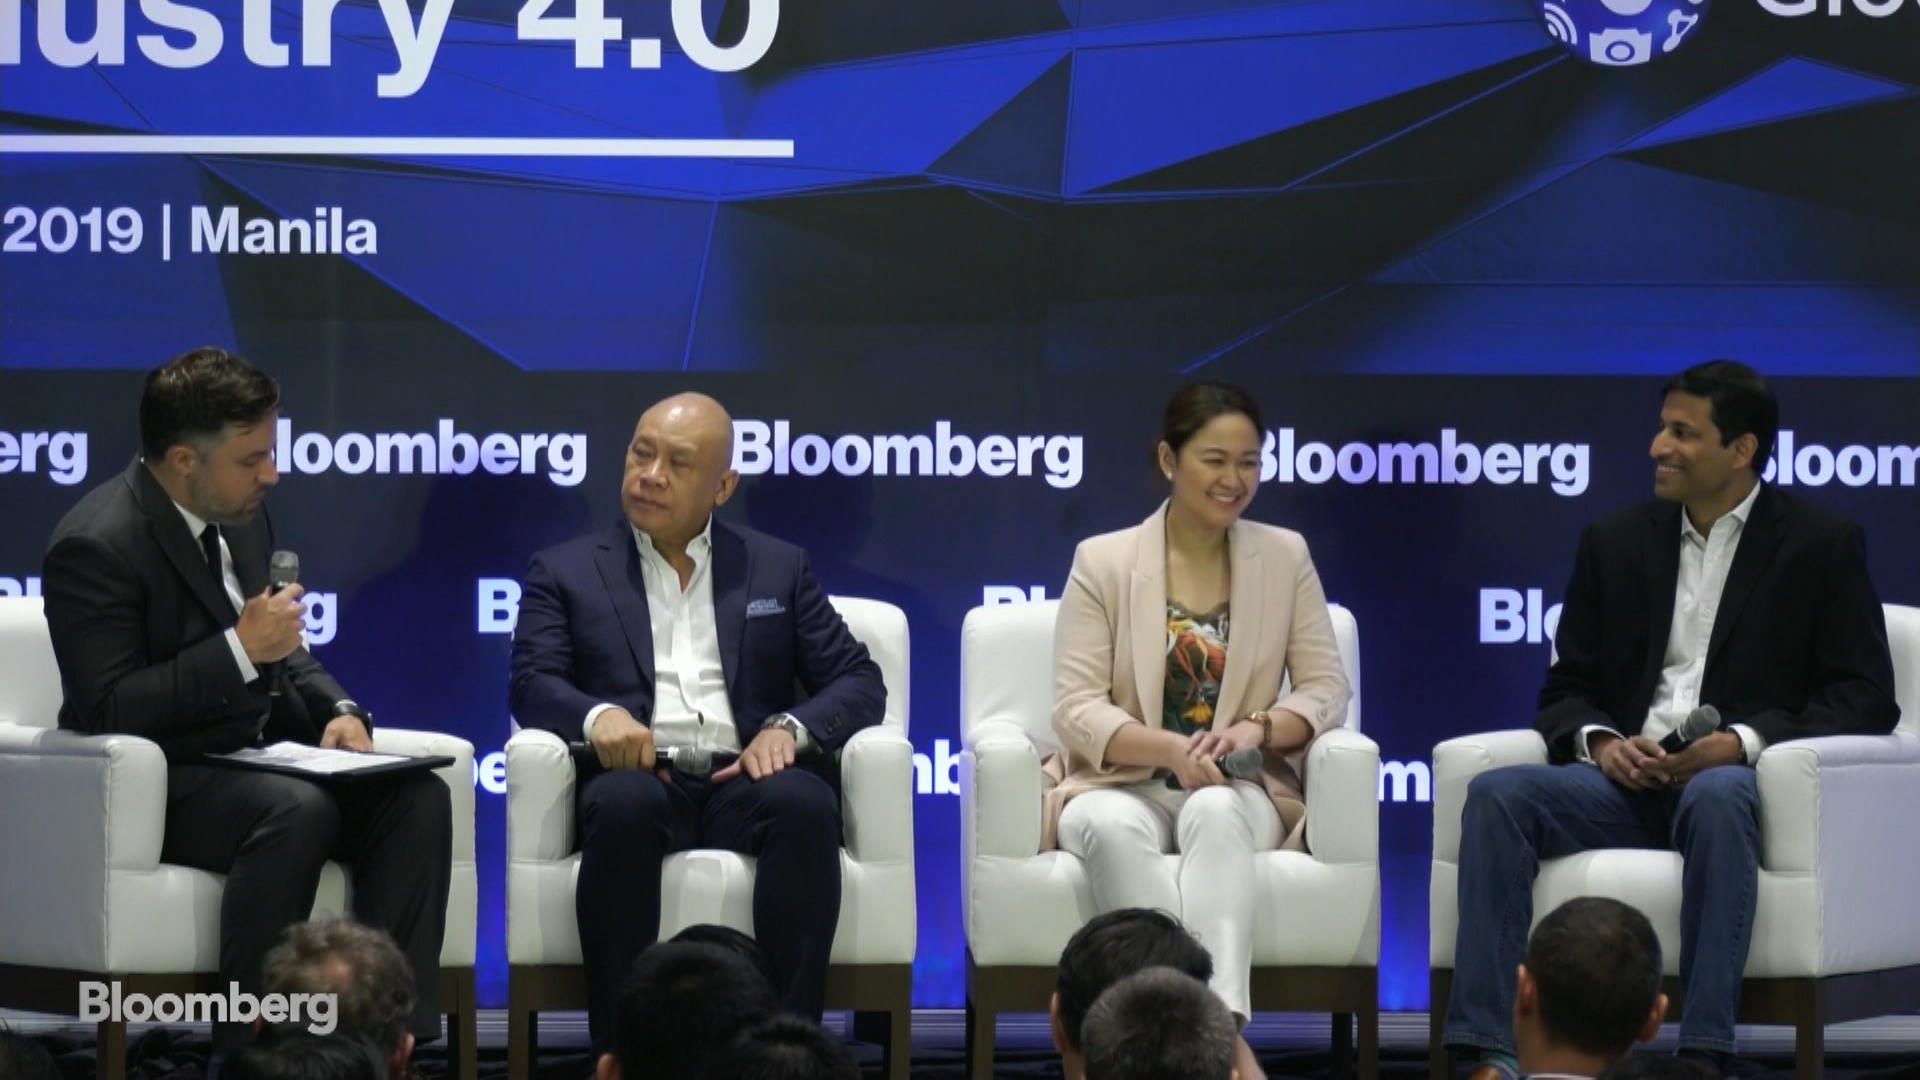 Digital Economy Explosion